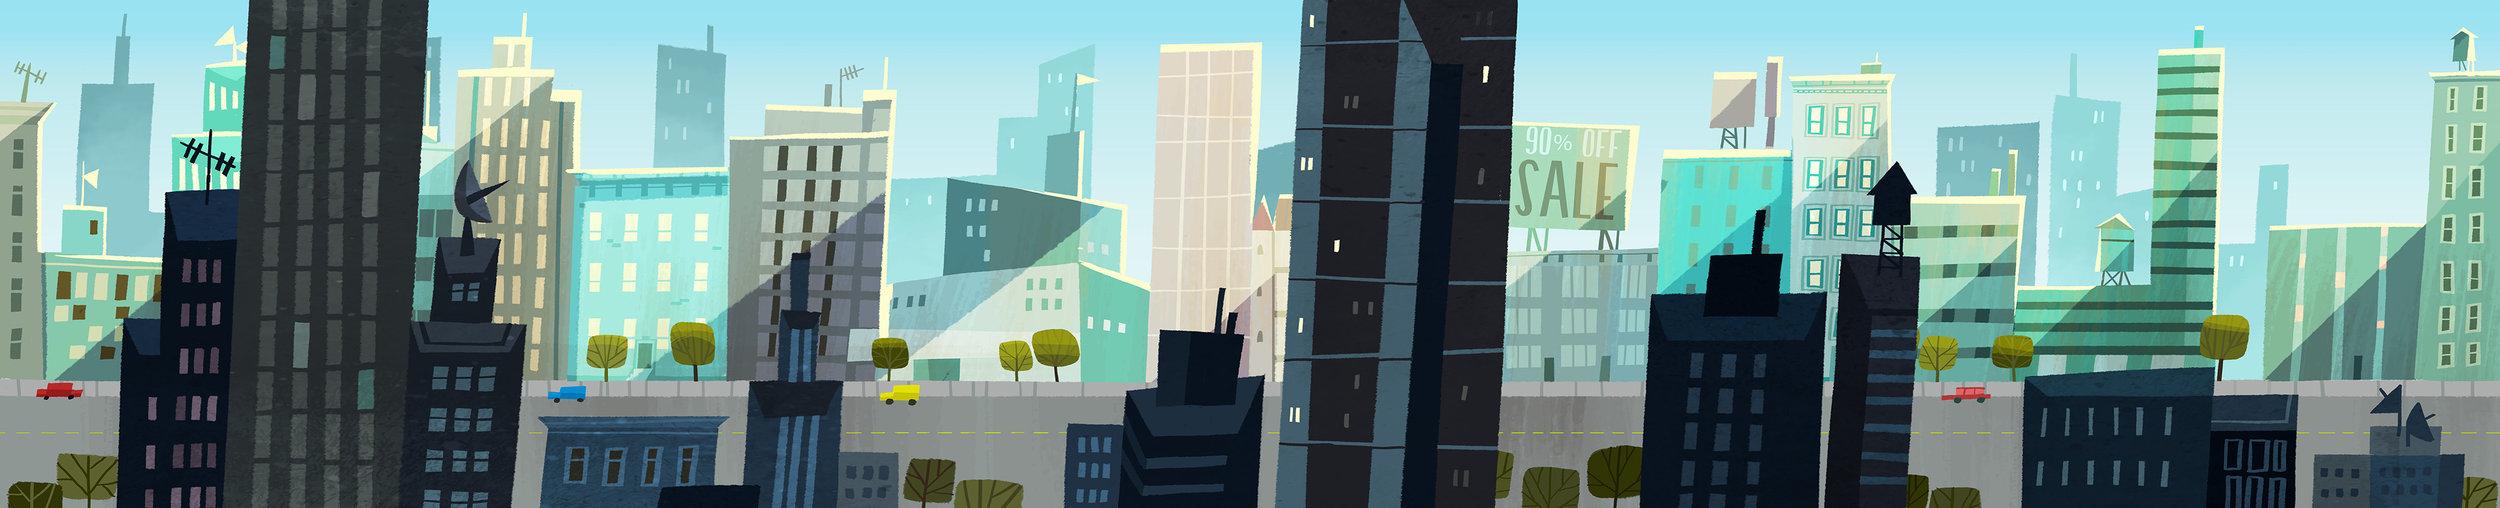 city2.jpg